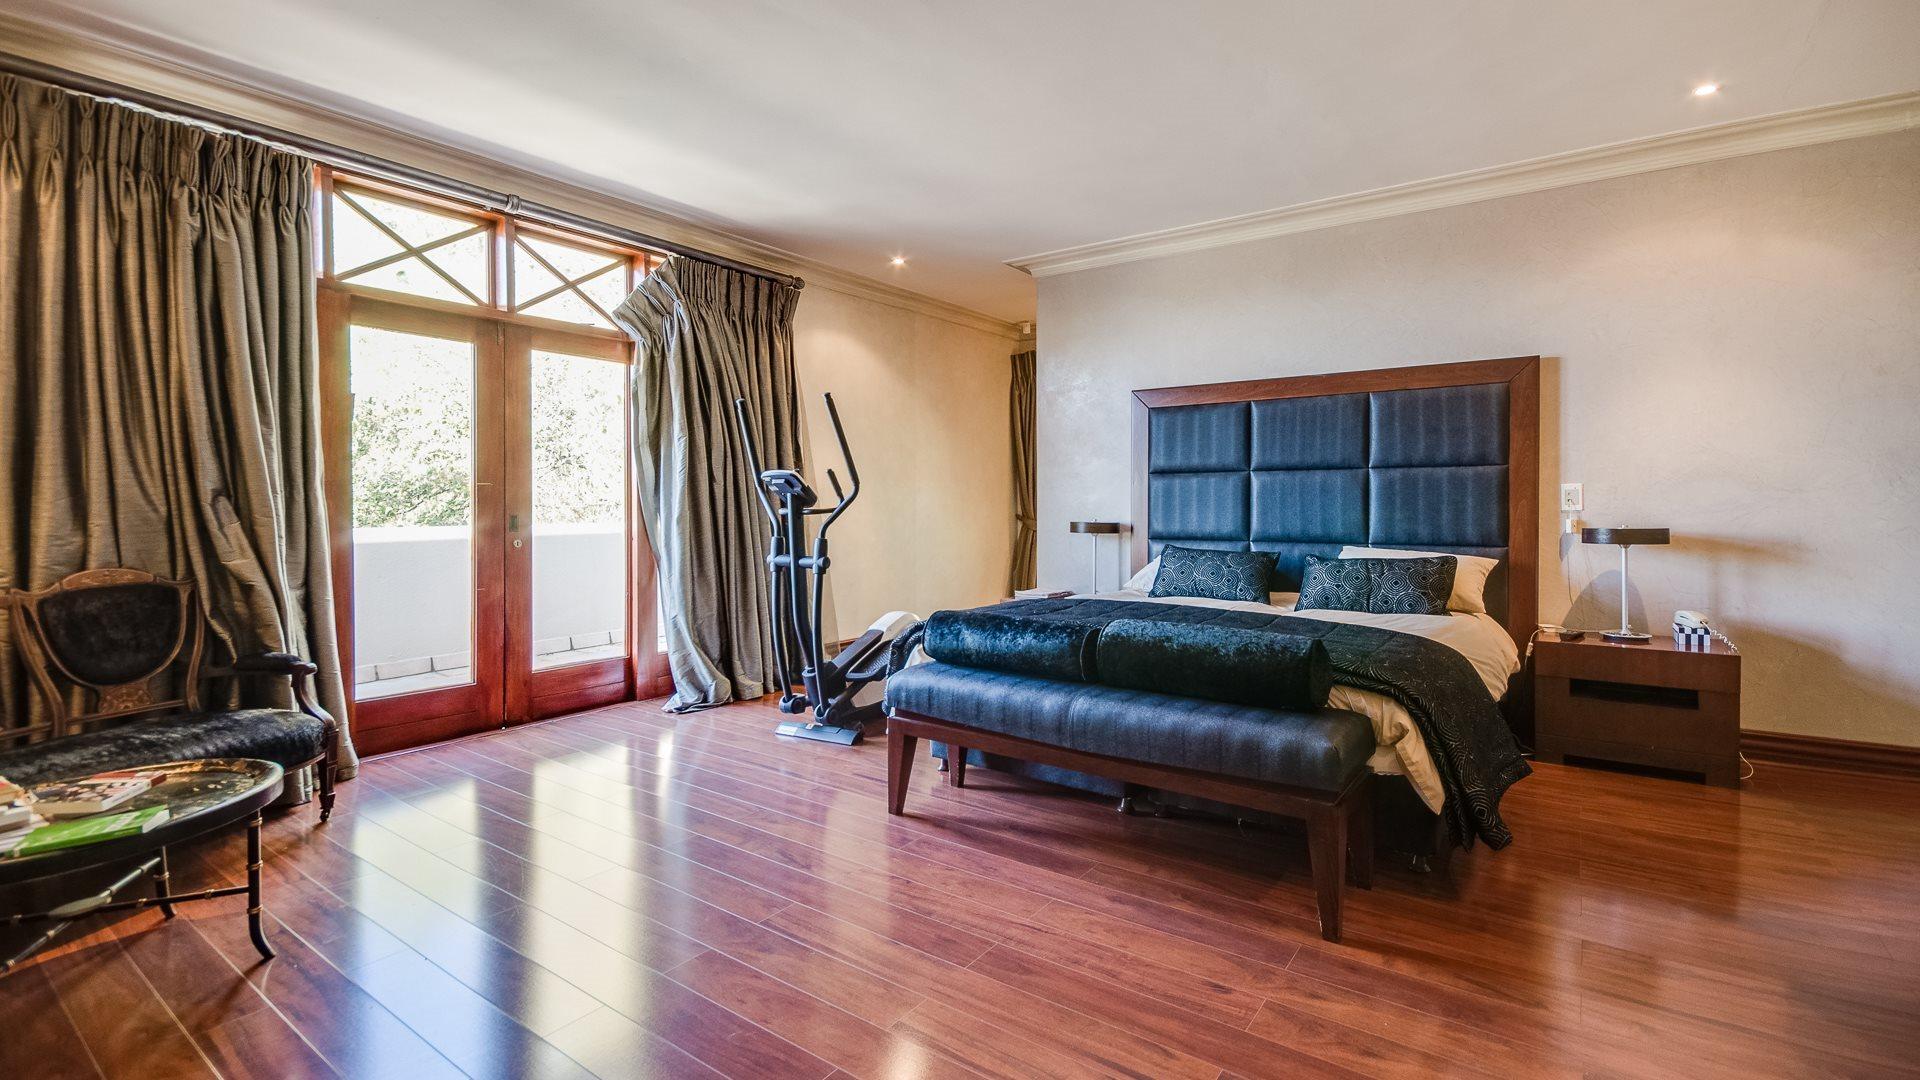 Houghton Estate property for sale. Ref No: 13527223. Picture no 12